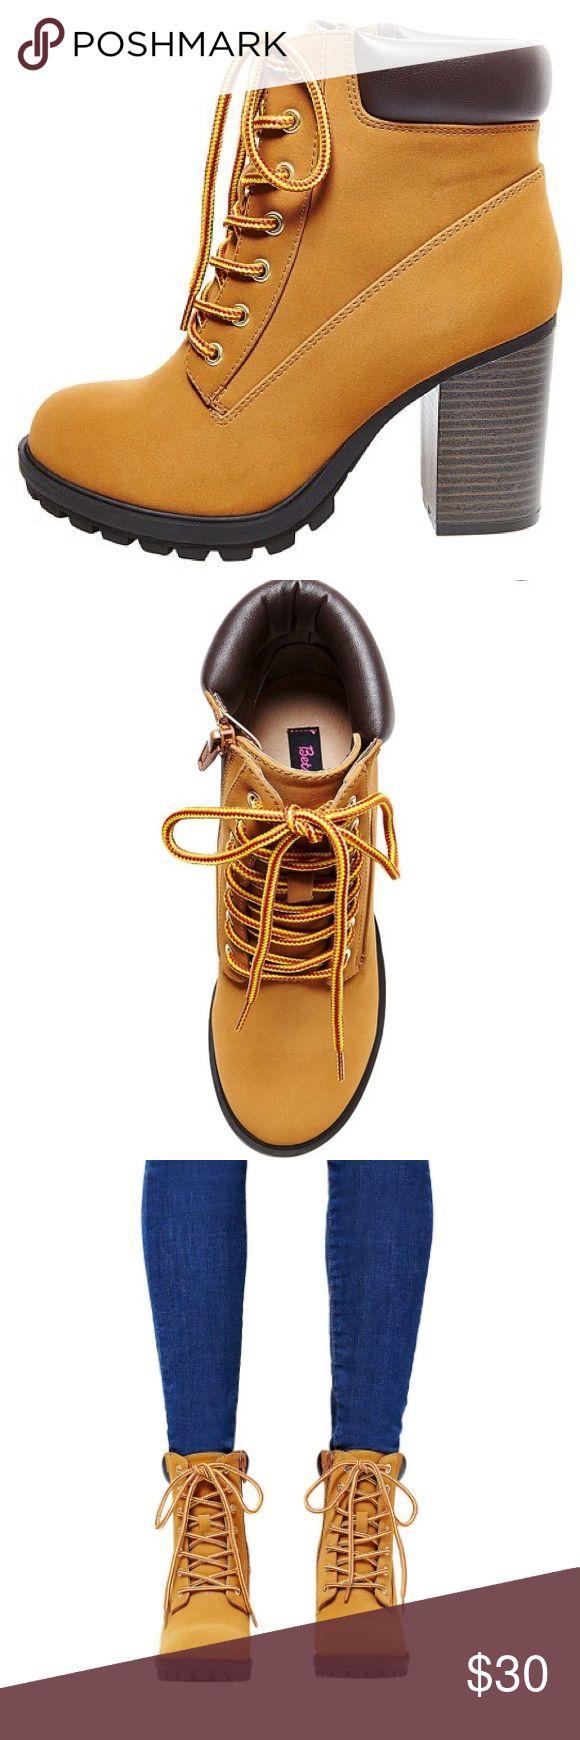 "Betsey Johnson Timberland Heels Betsey Johnson ""Betseyville"" timberland high heels                                                                         NWOT, never worn Betsey Johnson Shoes Heeled Boots"